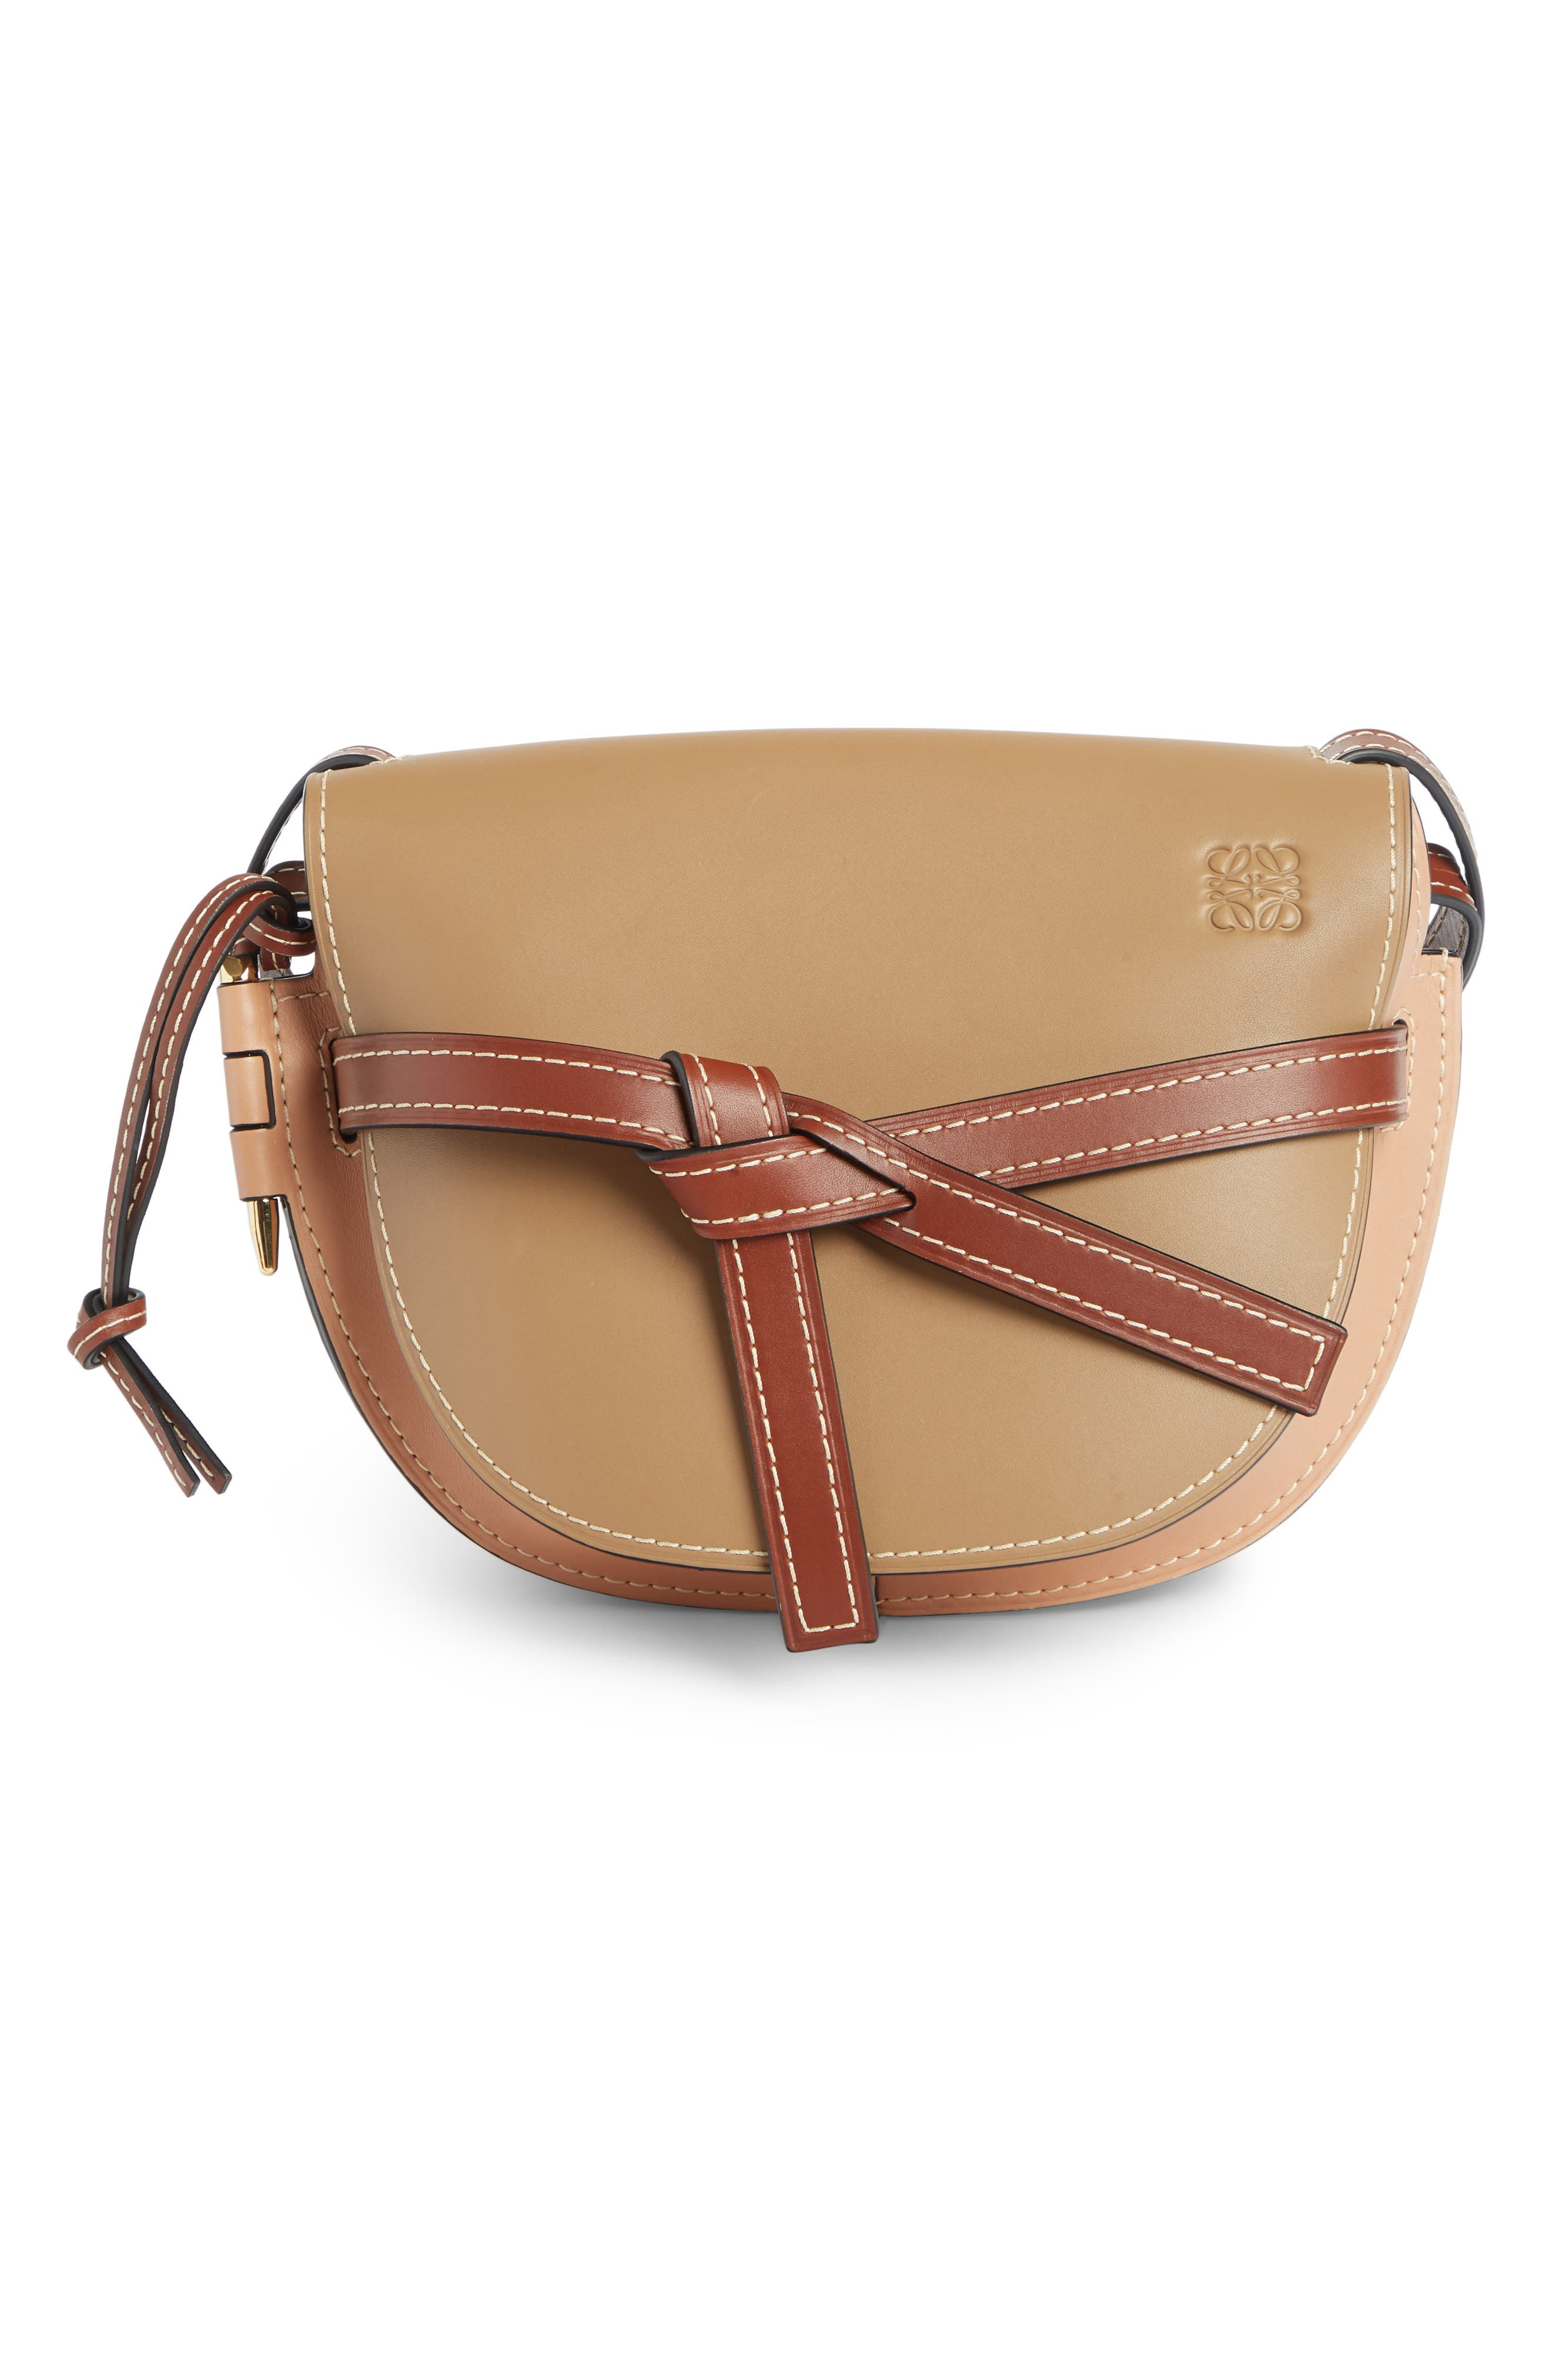 Loewe Gate Small Leather Crossbody Bag   Nordstrom